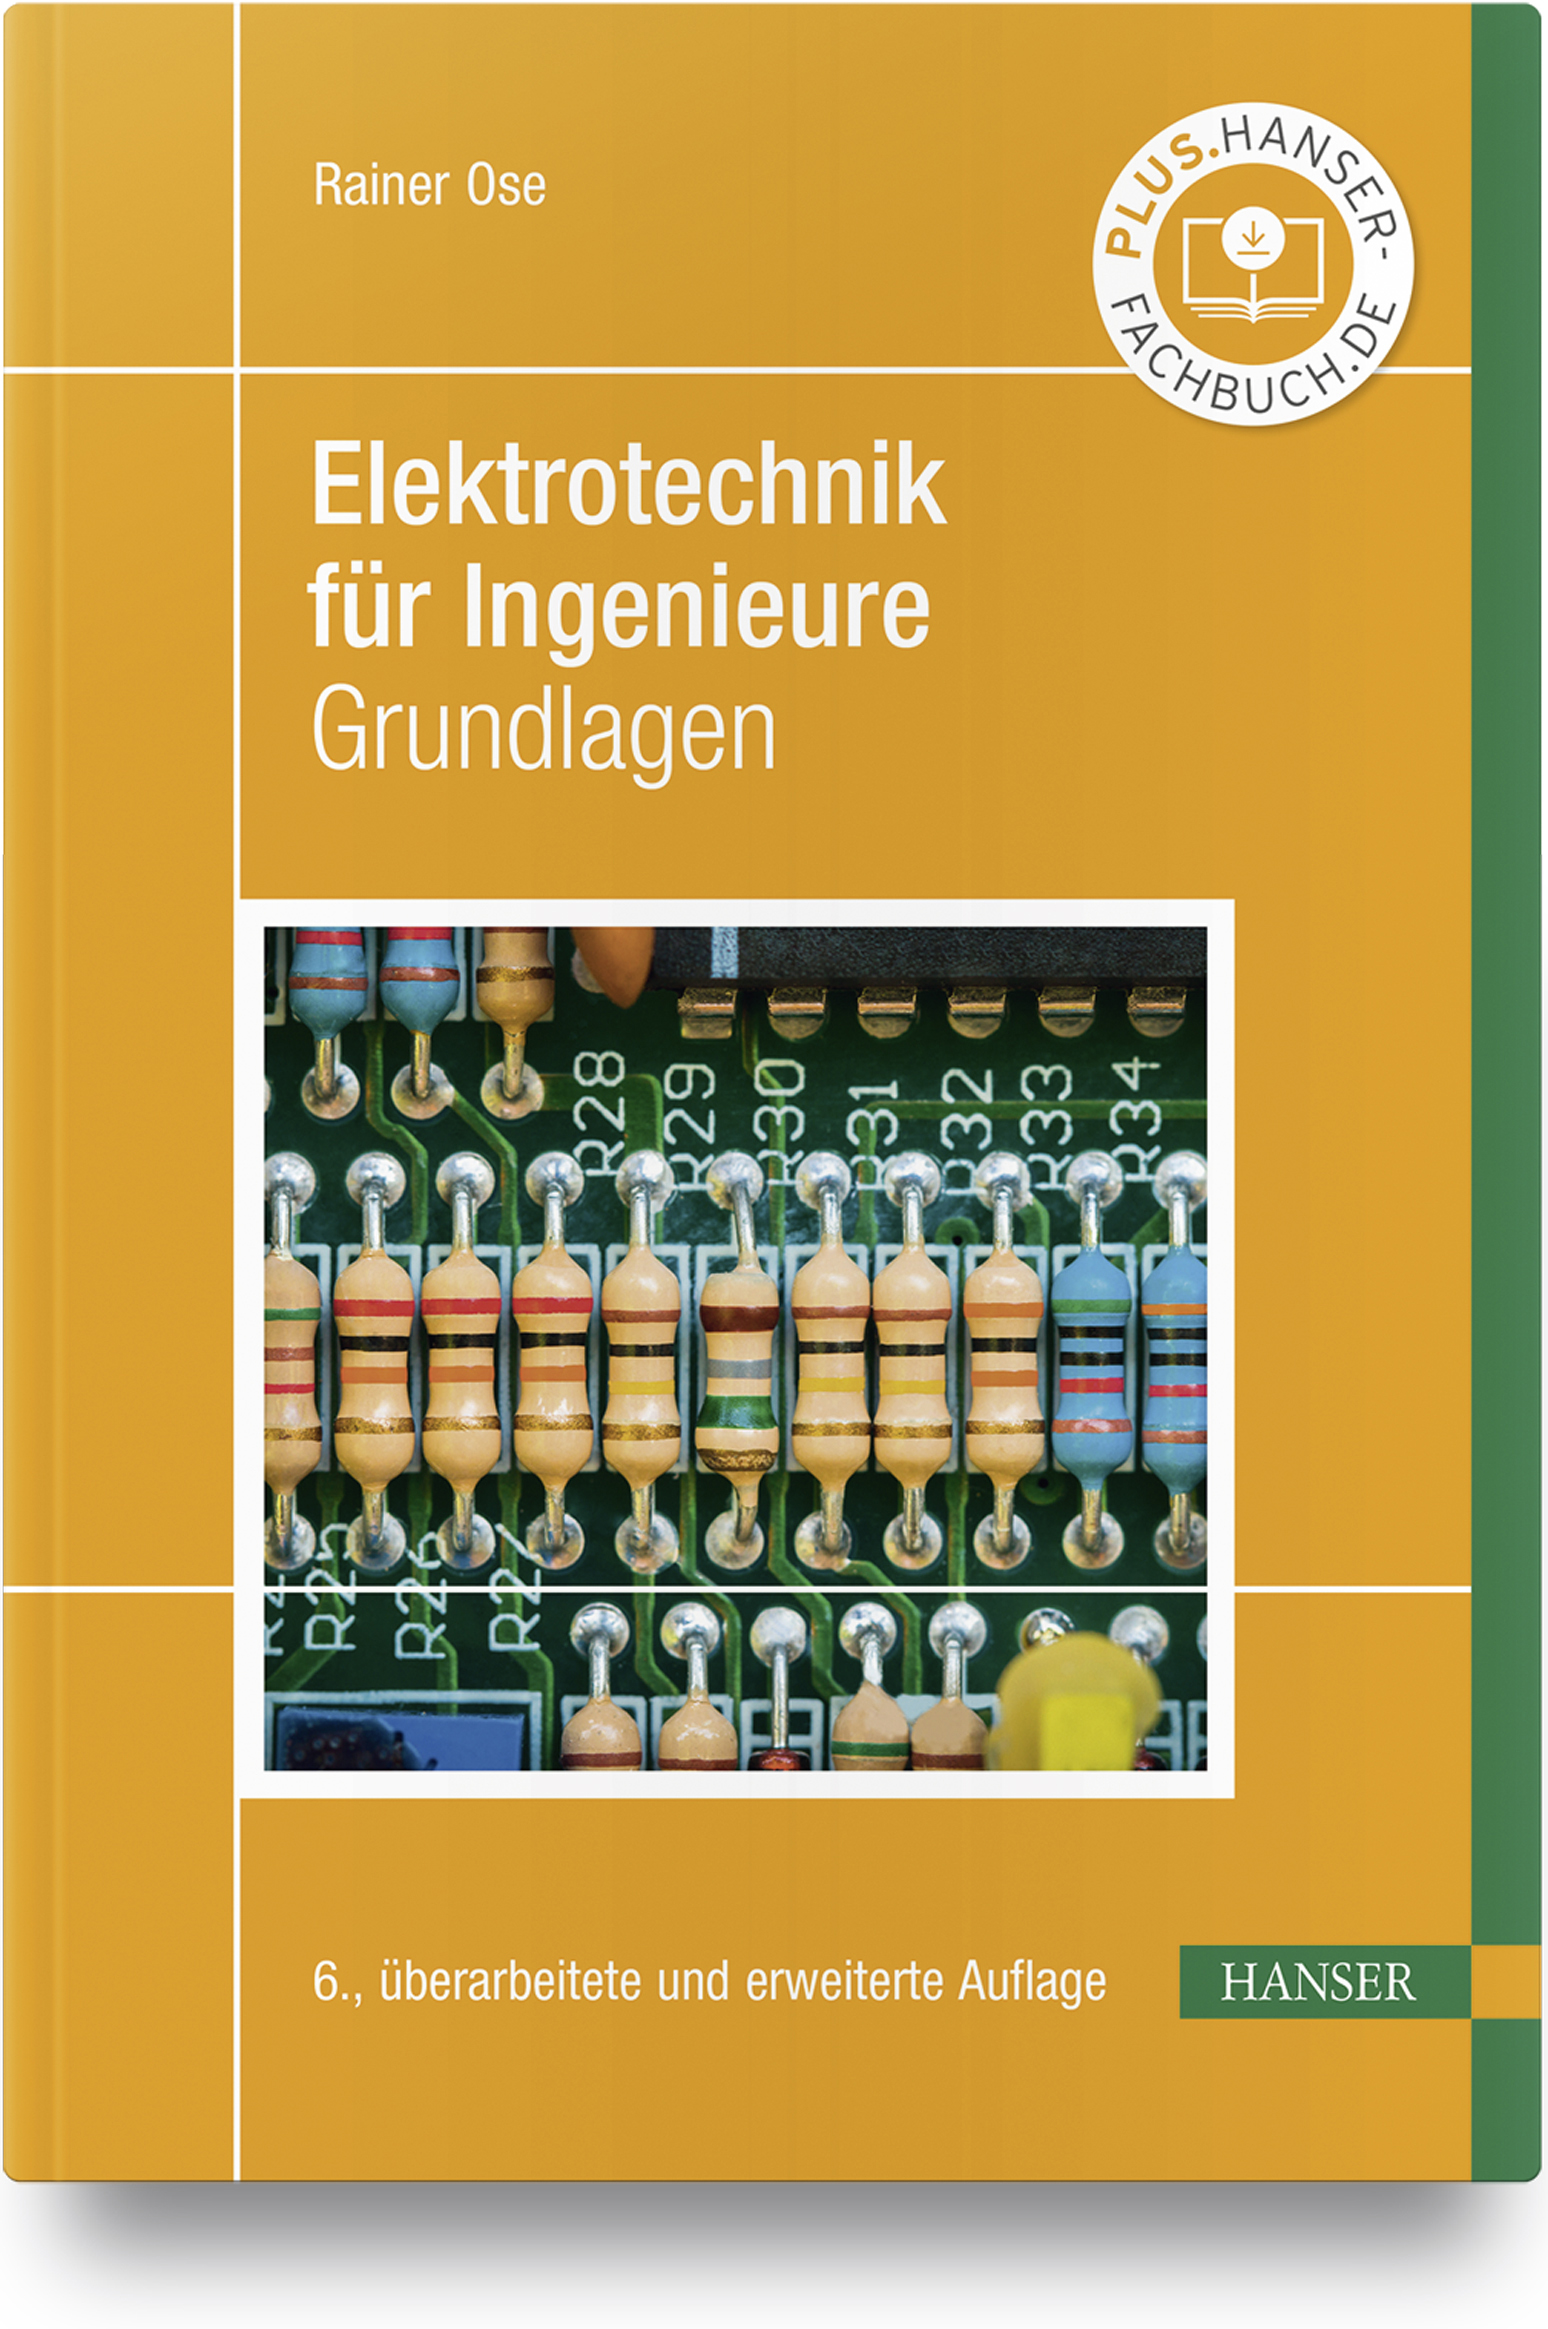 Ose, Elektrotechnik für Ingenieure, 978-3-446-46408-7